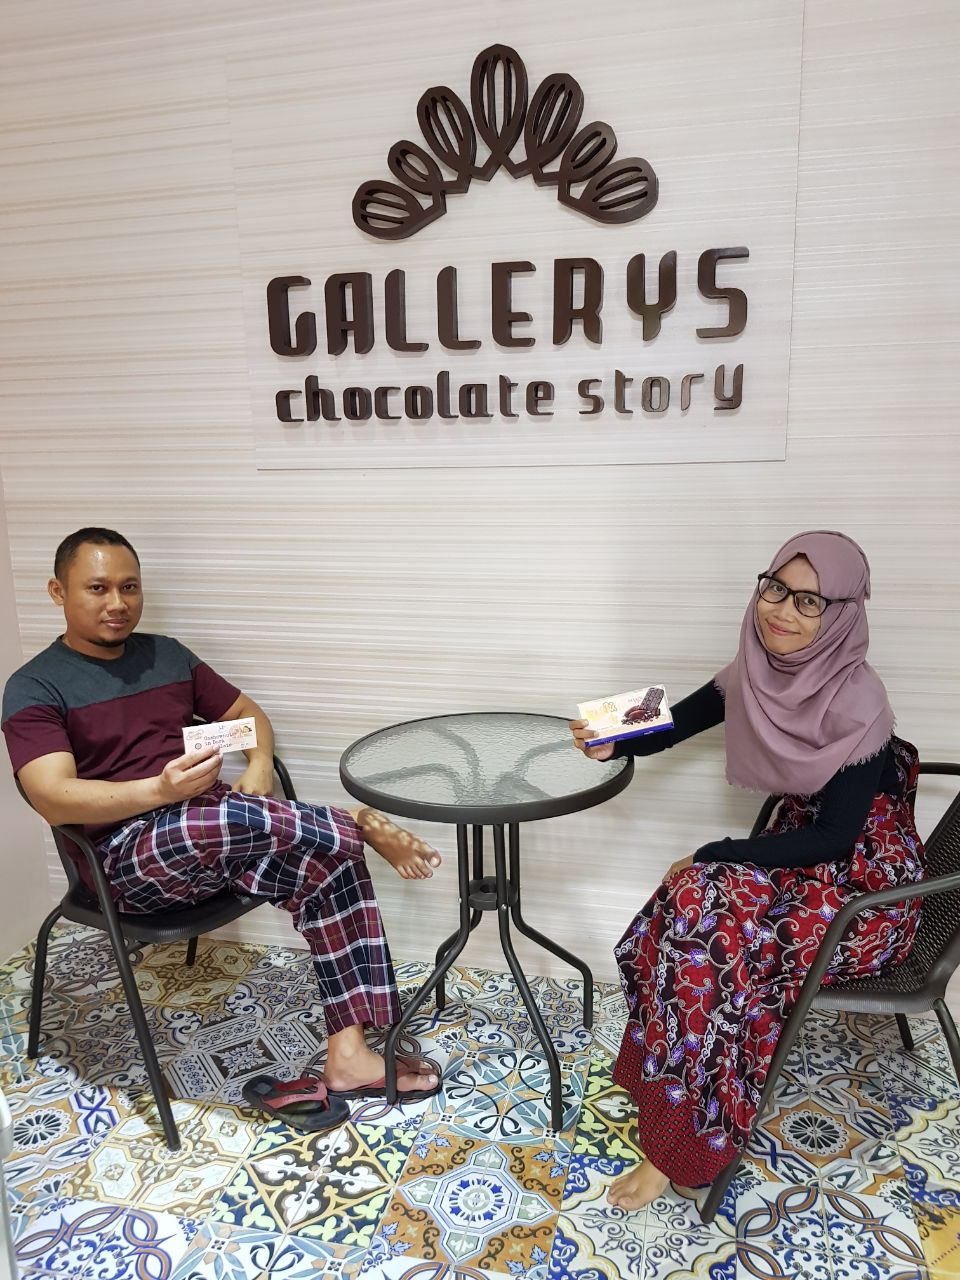 Wisata Edukasi Kampung Cokelat 'Gallerys Chocolate Story' di Kendal - BLOGGER KENDAL